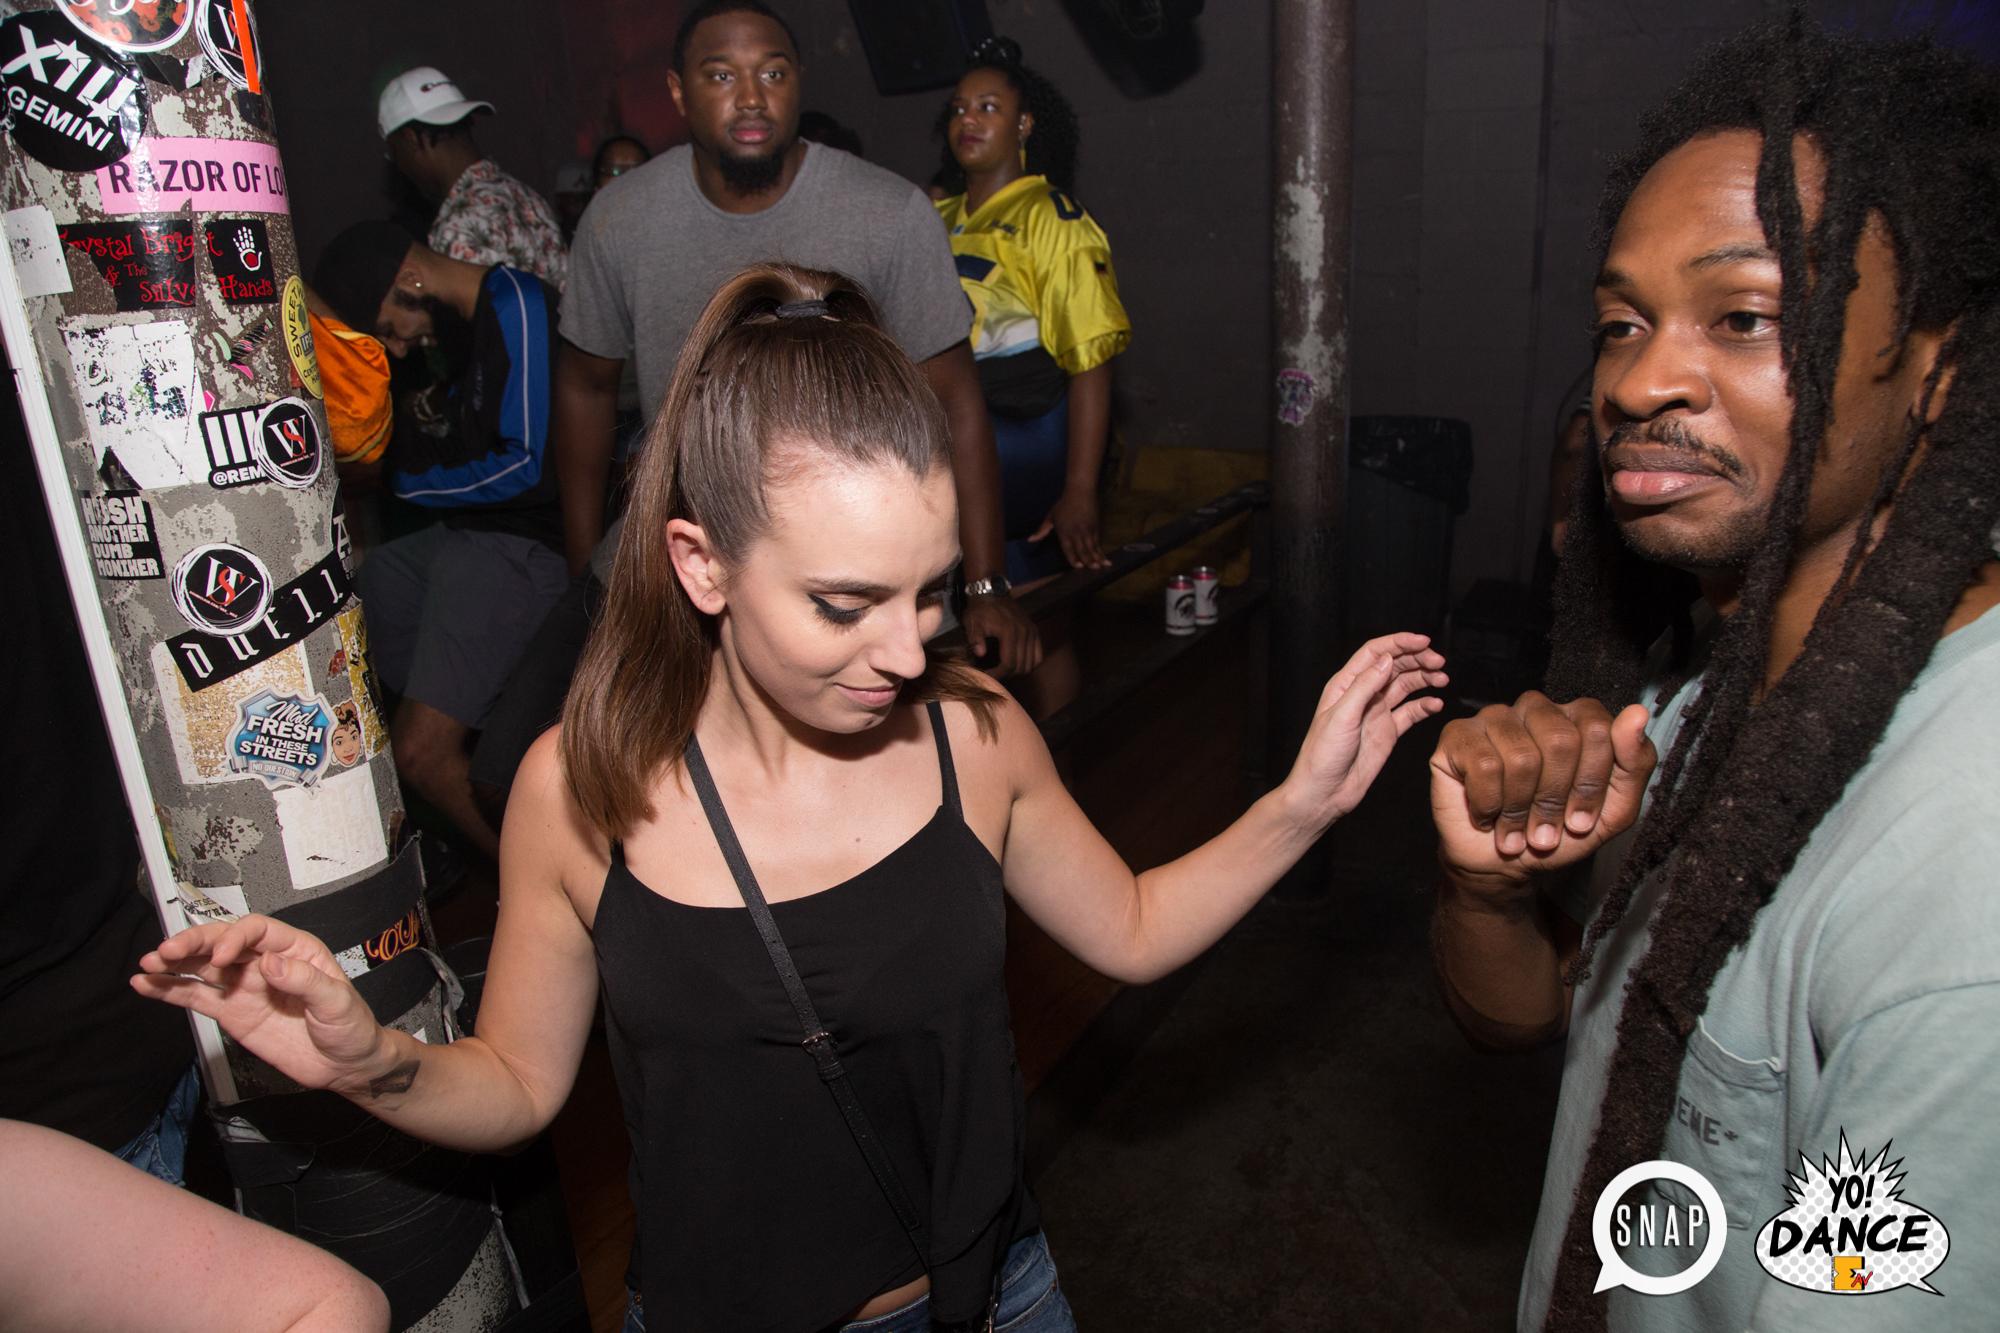 4Yo Dance Oh Snap Kid Atlanta.jpg